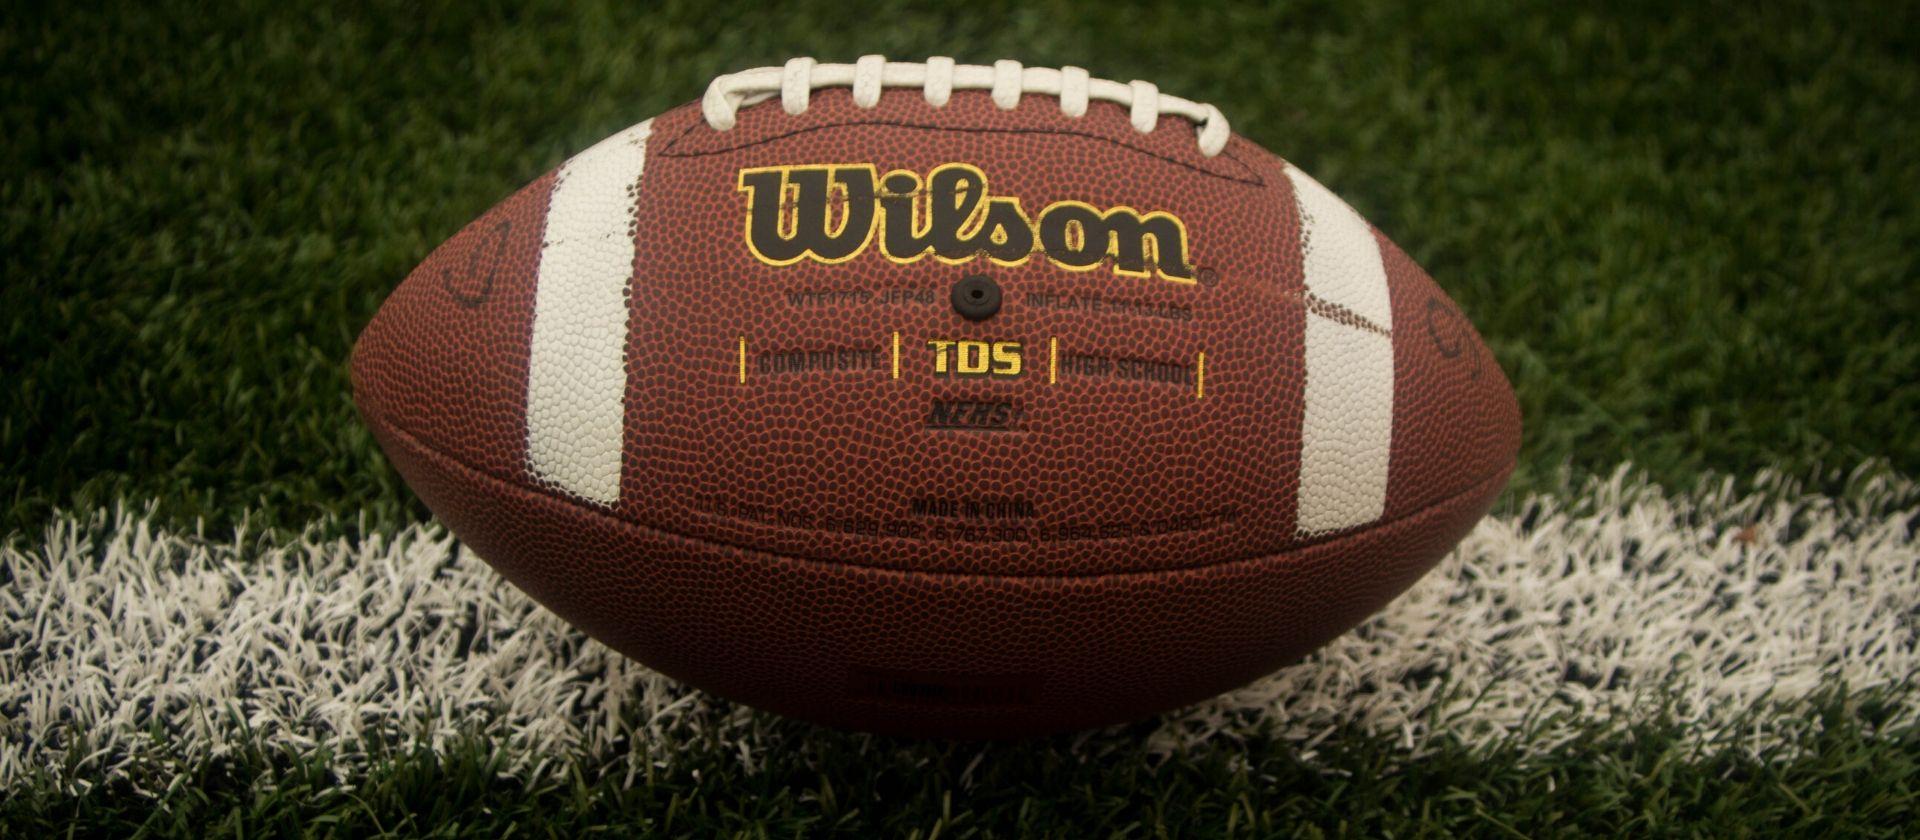 Football Super Bowl LIV